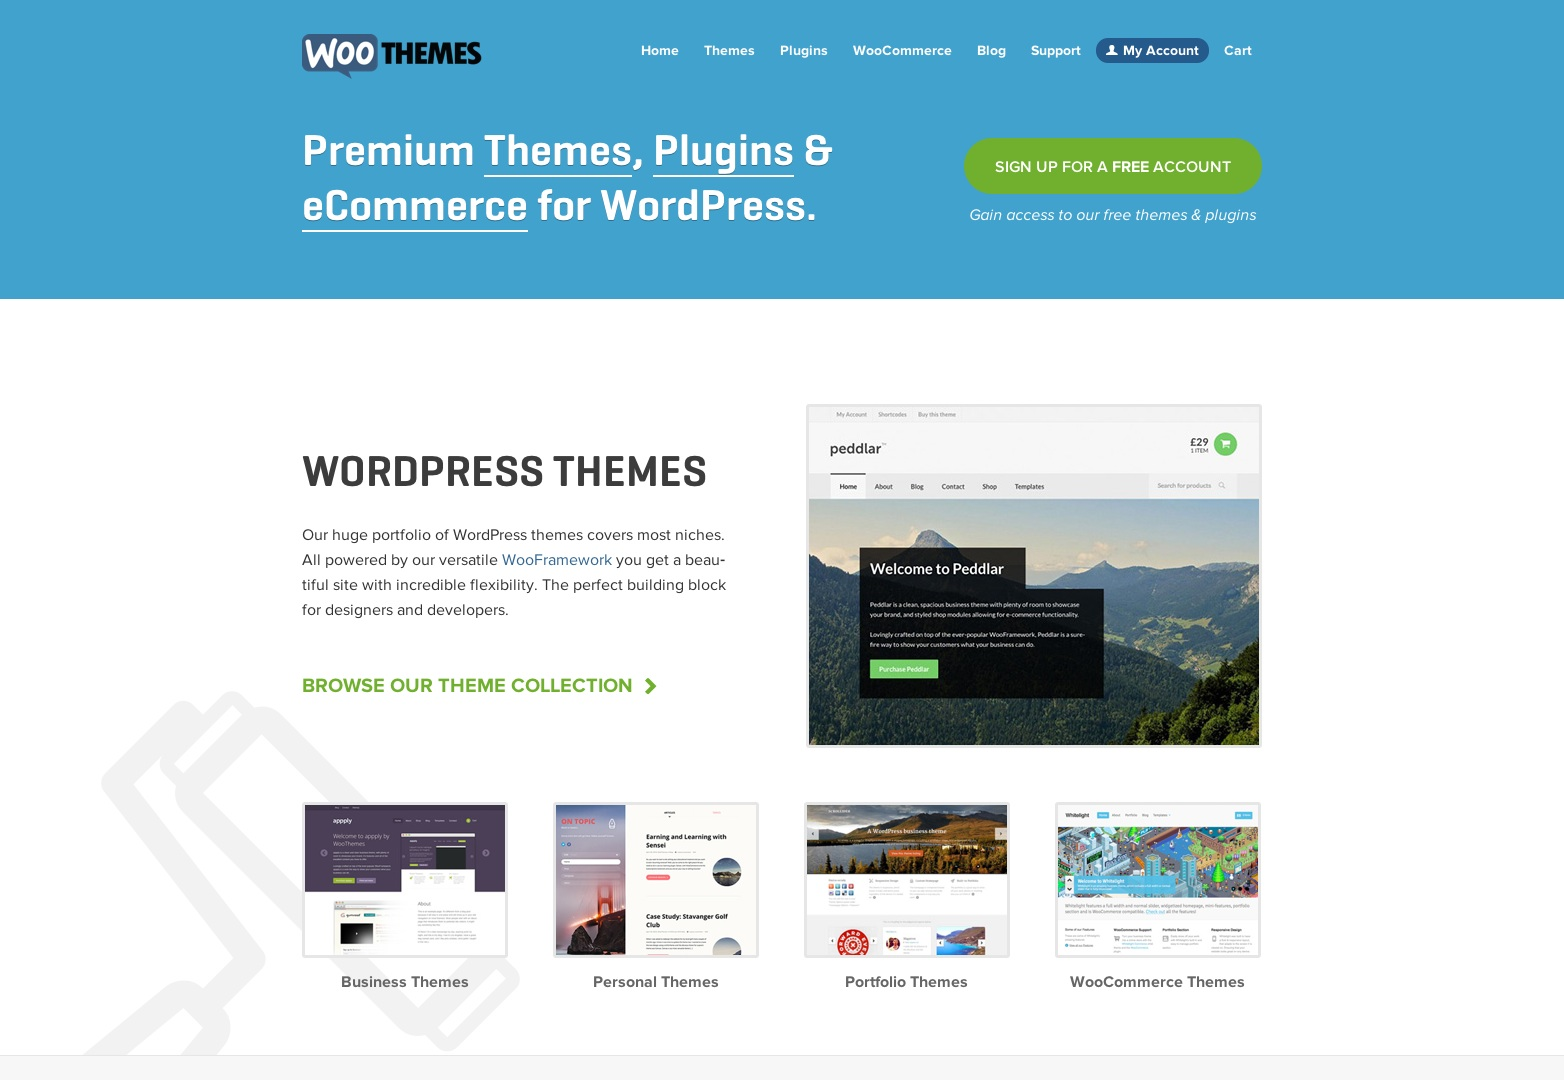 WooThemes | Premium WordPress Themes & Plugins